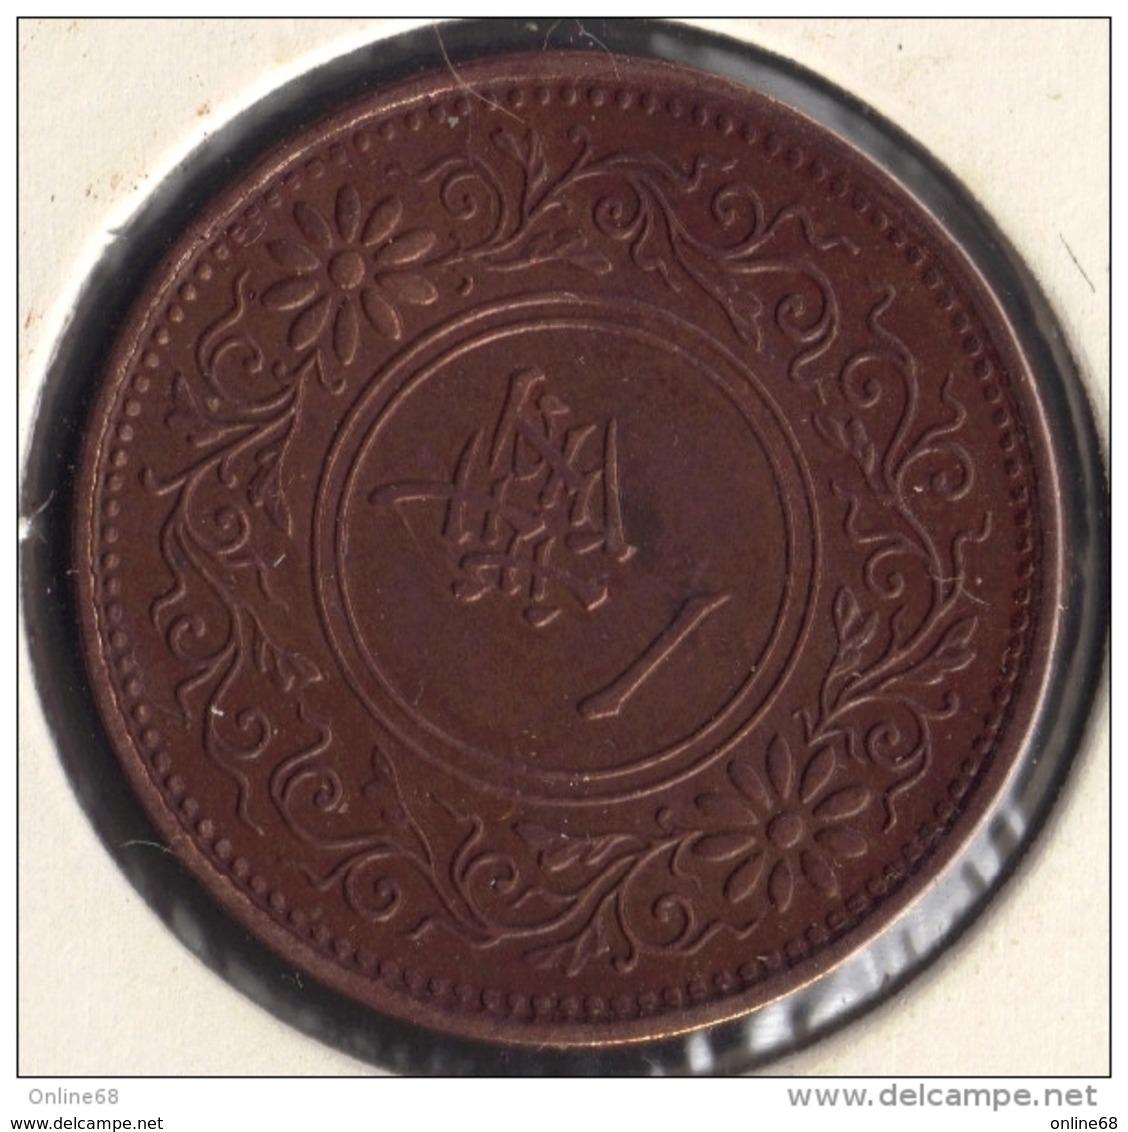 LOT 4 COINS JAPAN 1 SEN 1922 - CAMBODIA 200 RIELS 1994 - CHINA 1 YUAN 1991 - MONGOLIA 50 MONGO 1981 - Monedas & Billetes